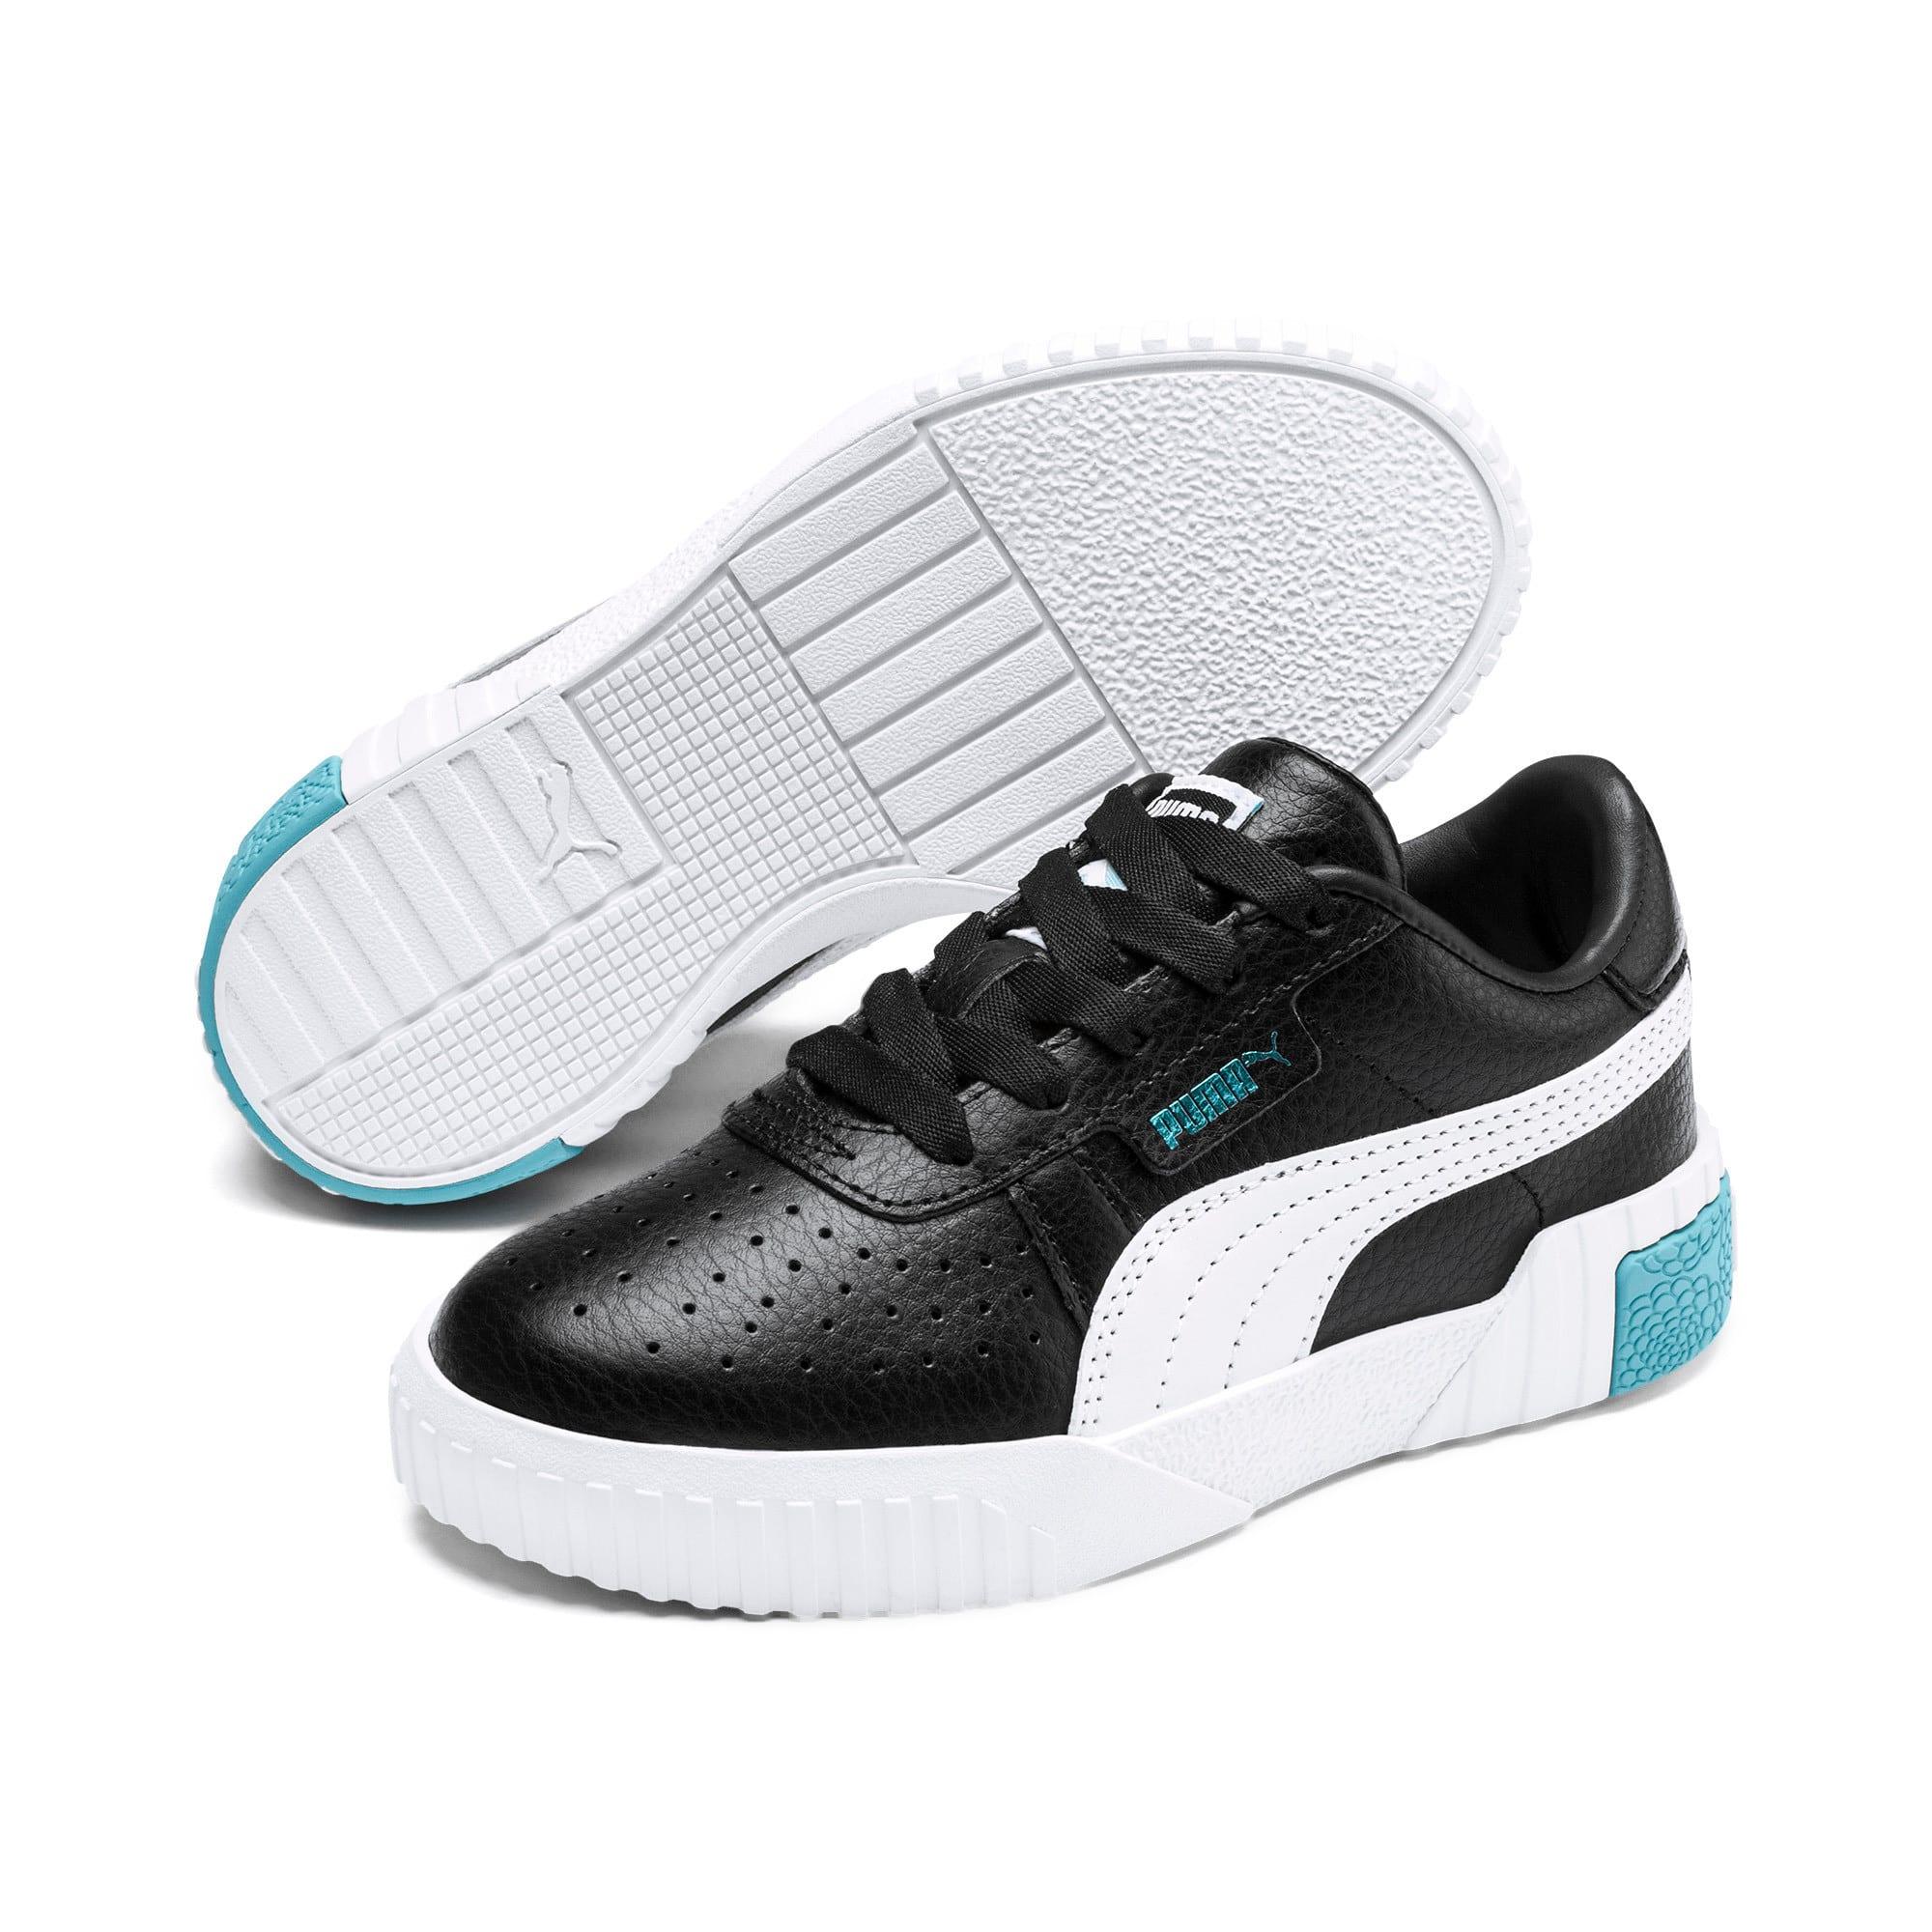 Thumbnail 2 of Cali Little Kids' Shoes, Puma Black-Milky Blue, medium